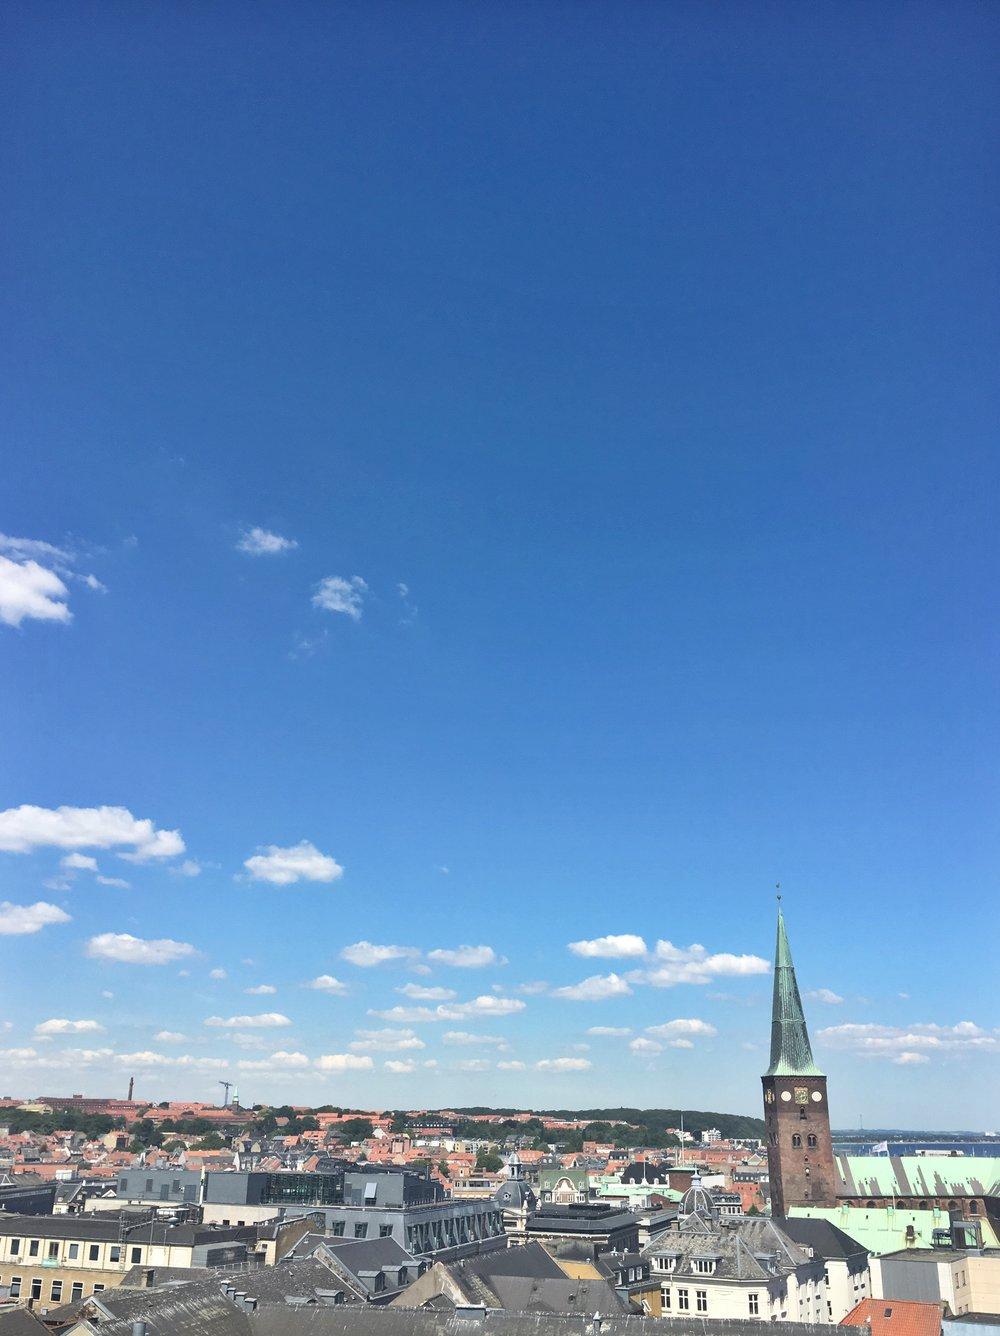 Aarhus Danmark Sølyst